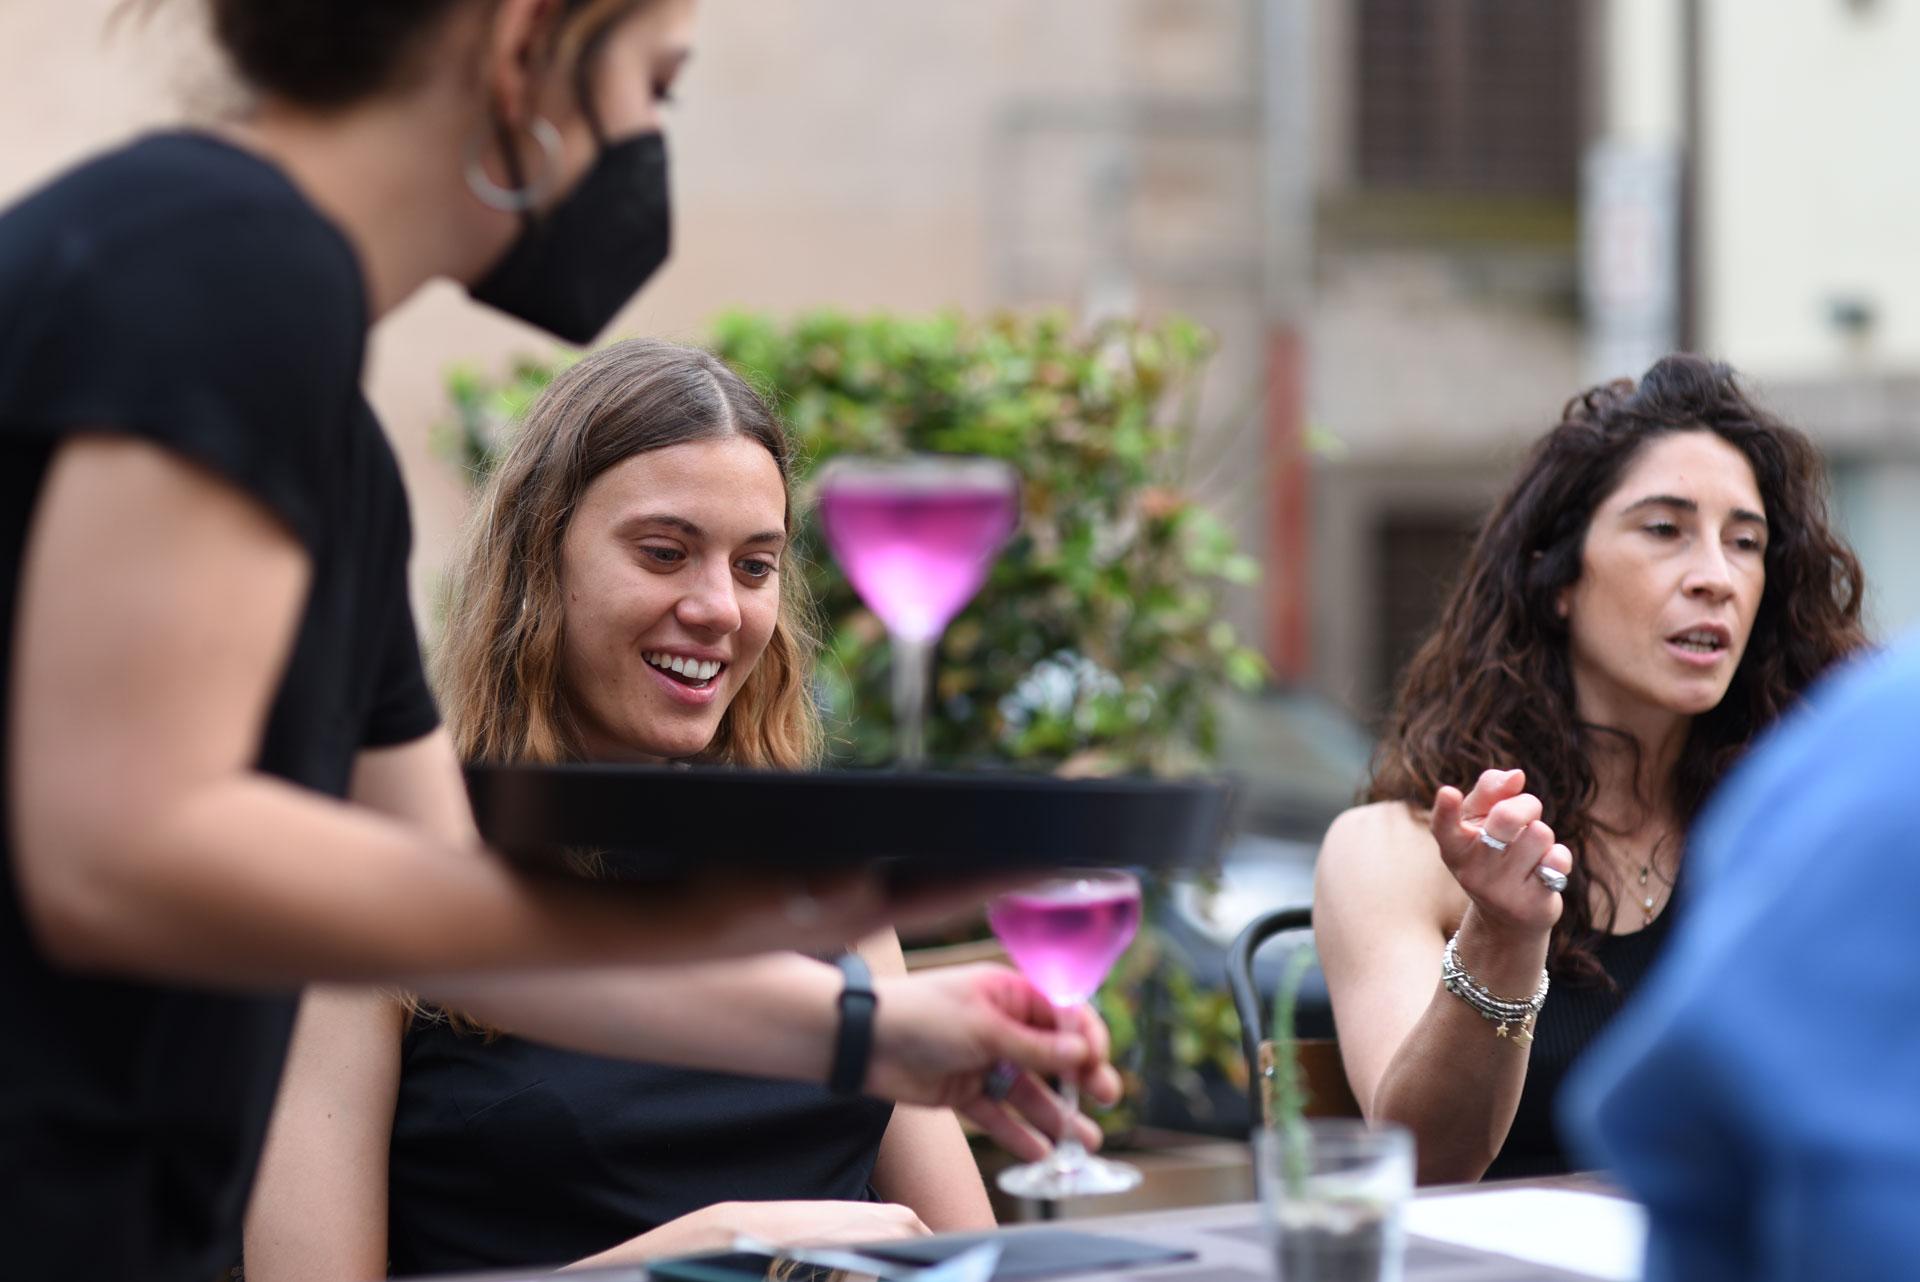 officina-visiva-lab-restaurant-riccardo-rosii-freni-e-frizioni-evento-drink-photographer-05